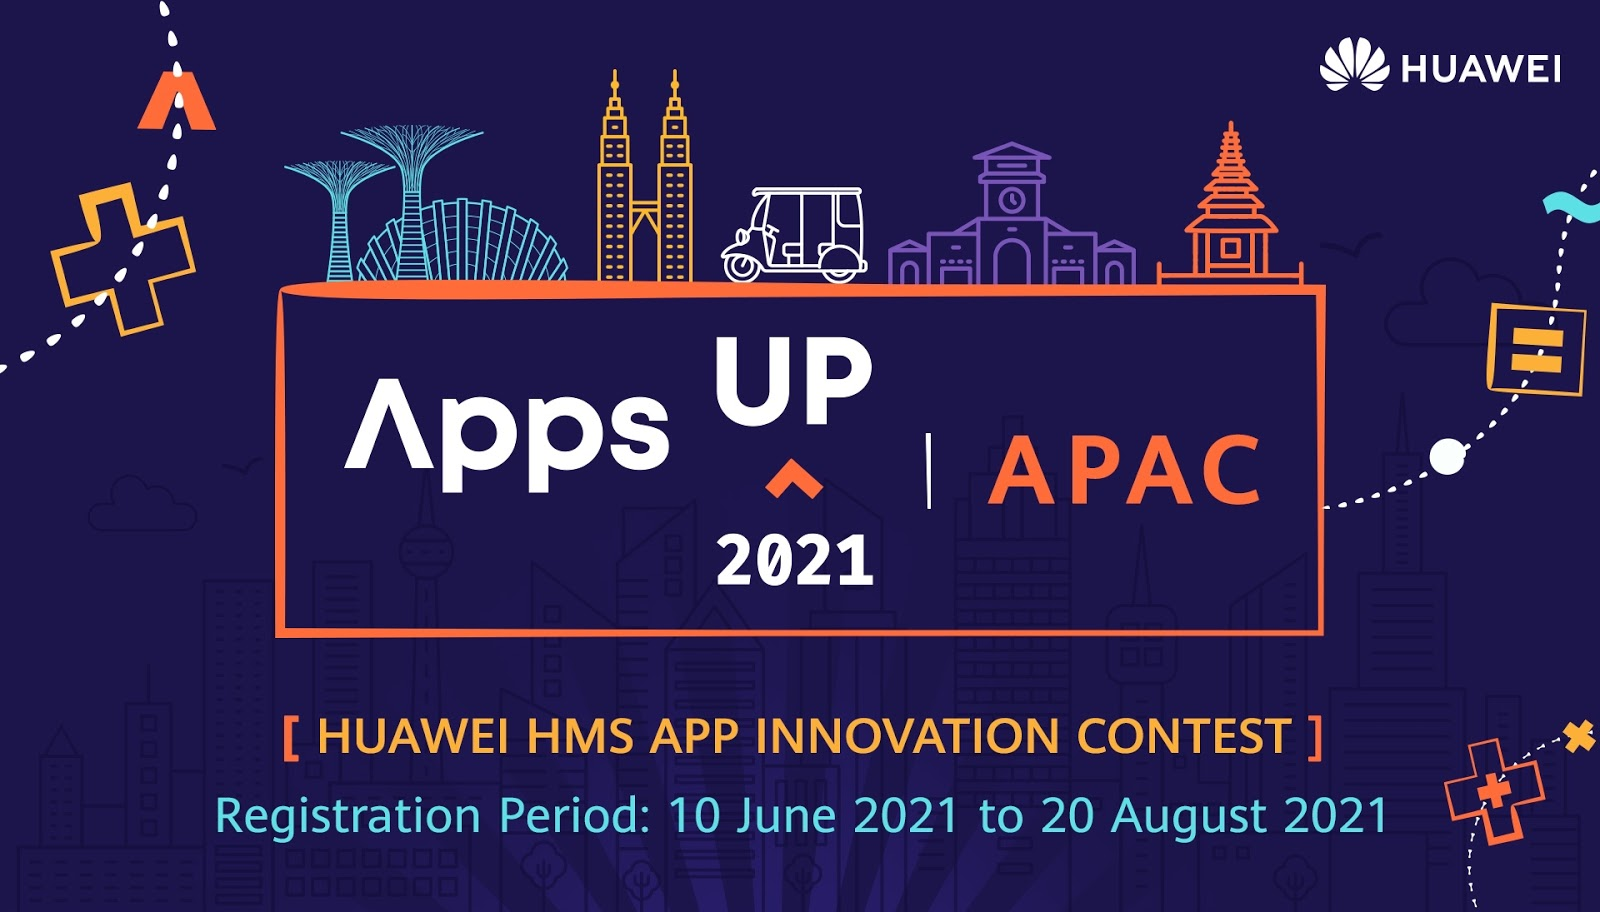 Huawei Mobile Services เปิดตัวการแข่งขัน AppsUP App ปีที่ 2 ในภูมิภาคเอเชียแปซิฟิกชิงเงินรางวัลรวมกว่า 6,000,000 บาท